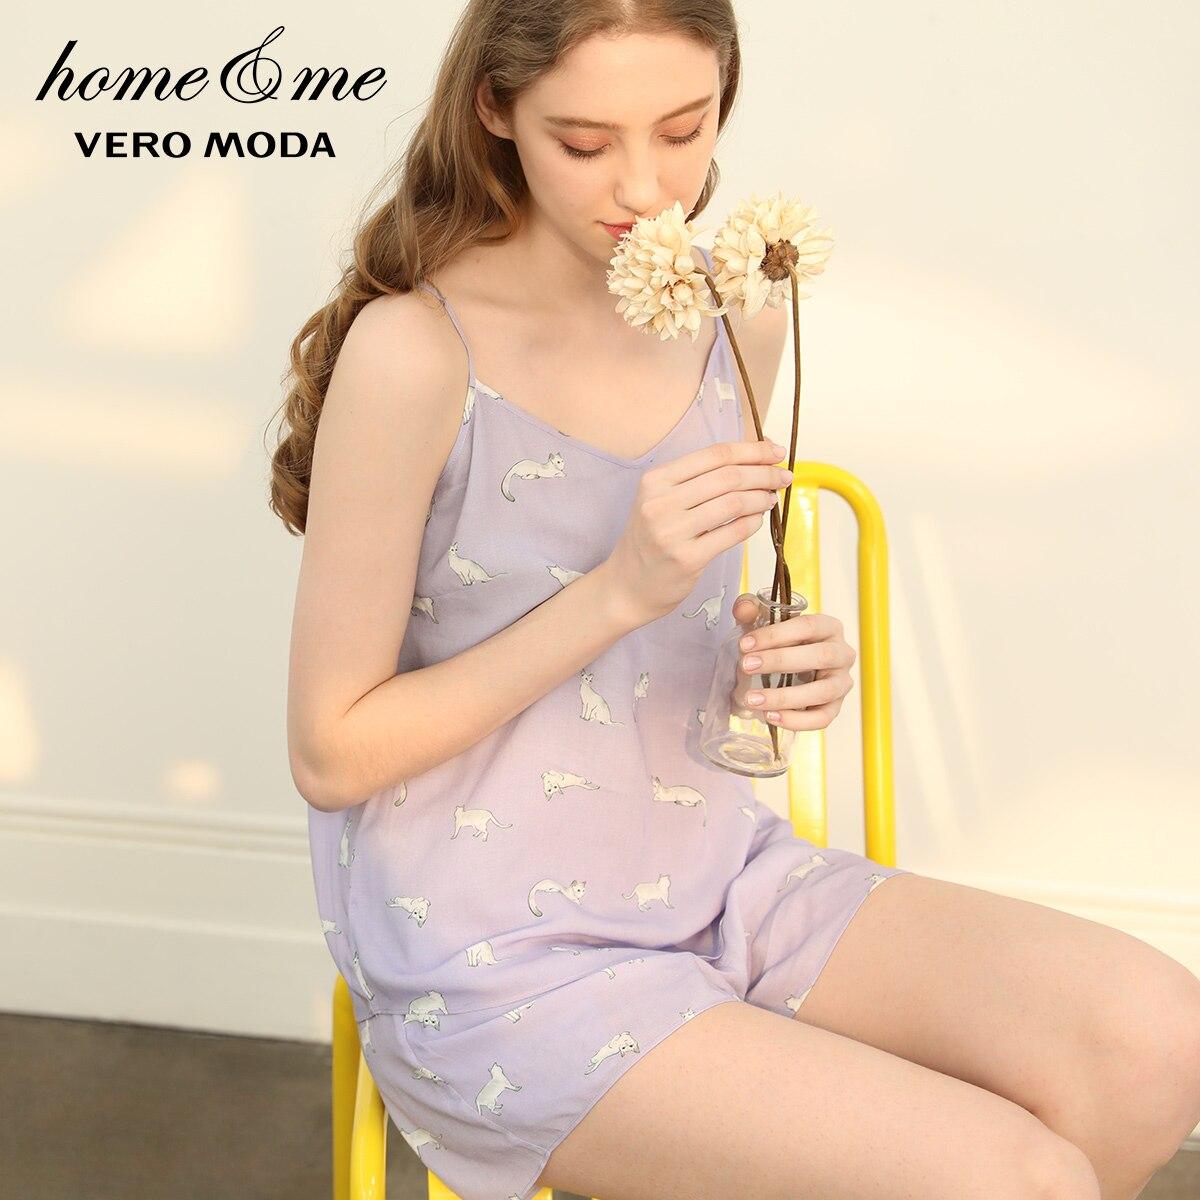 Image 2 - Vero Moda 2019 New Arrivals Cat Print Sun top Leisure Homewear Pajamas Set   3192TC505-in Pajama Sets from Underwear & Sleepwears